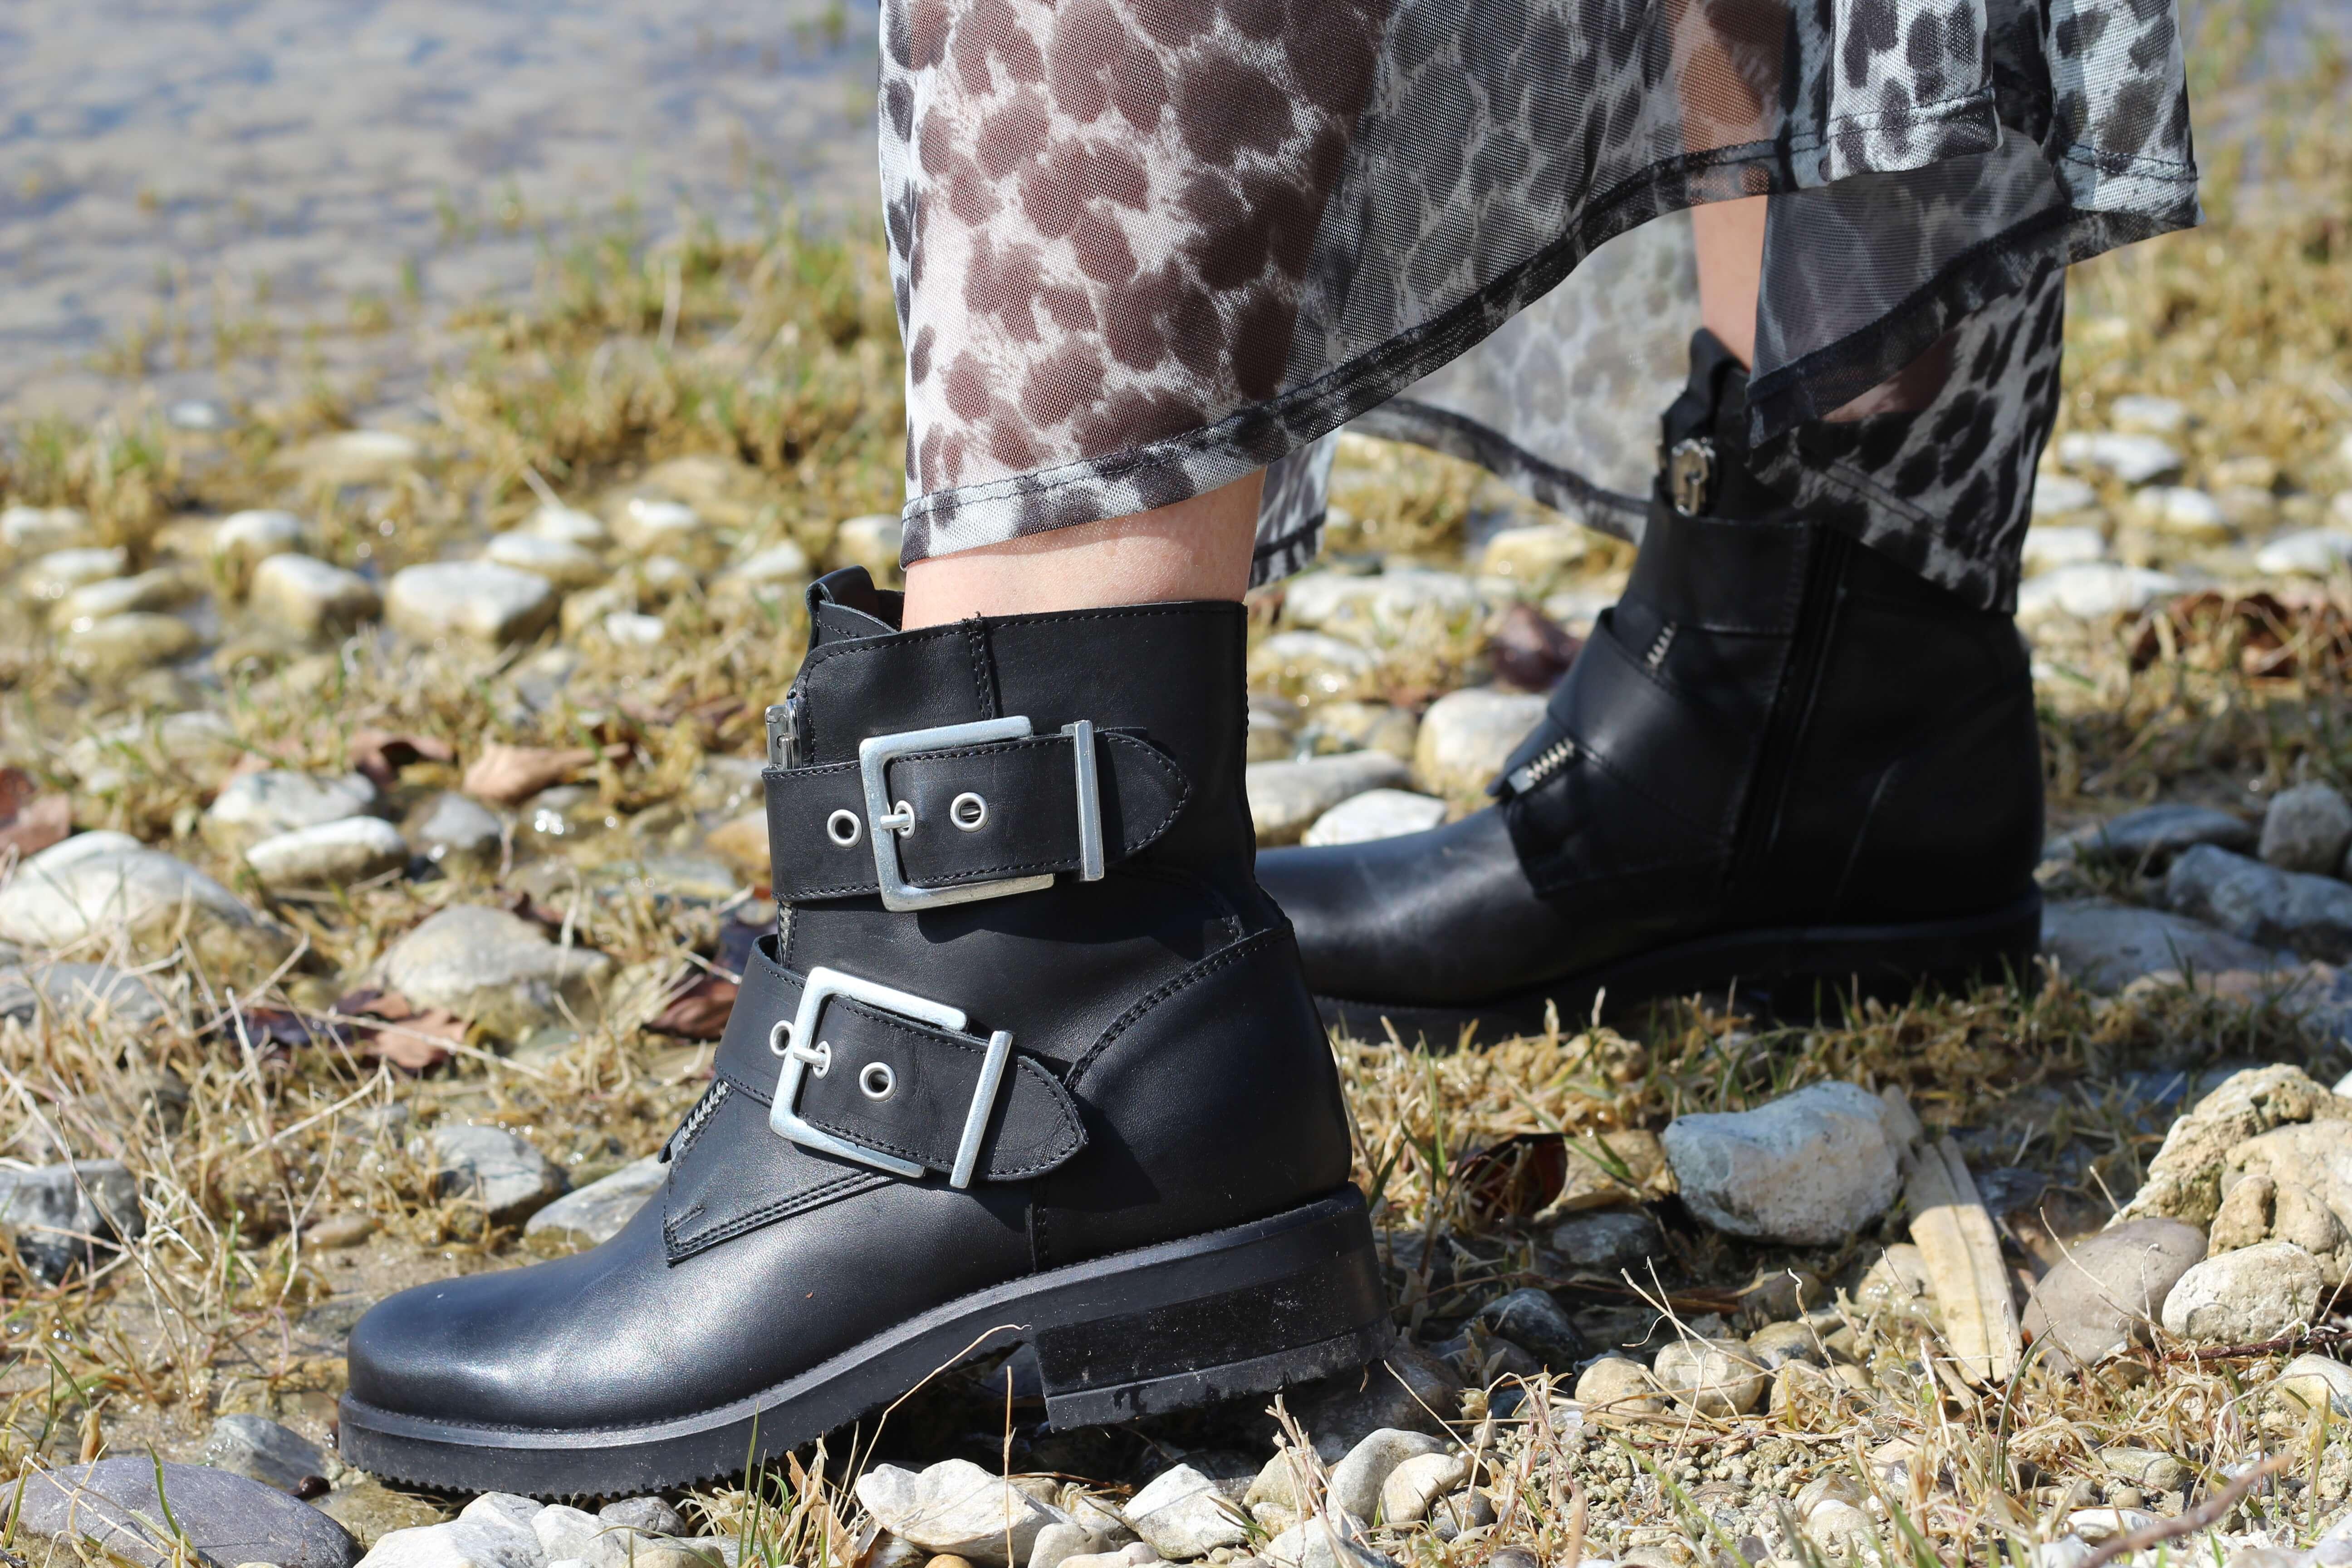 Festival Style: Boots - der ideale Festivalschuh